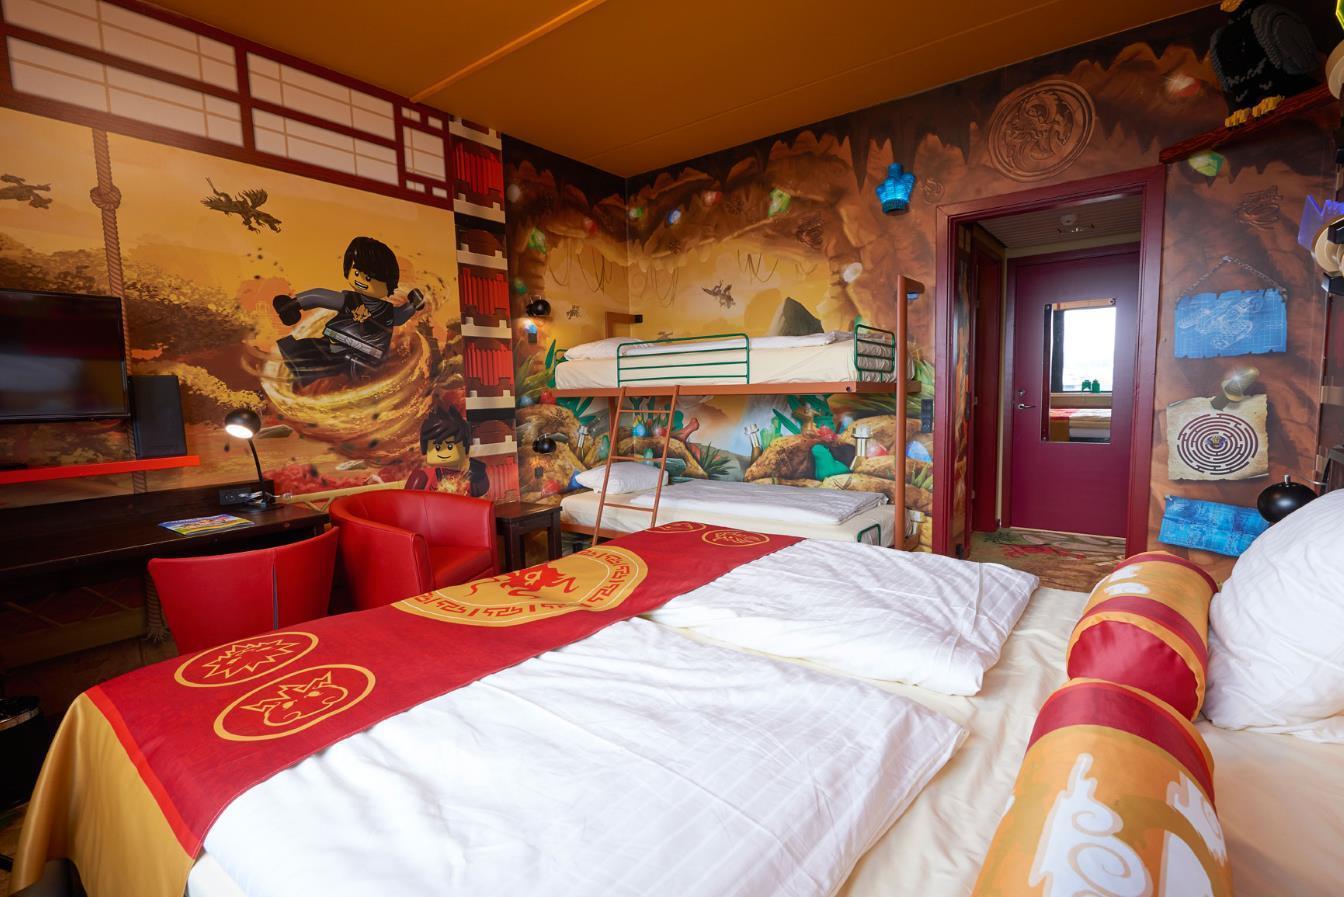 Hotel legoland lego ninjago room legoland holidays - Bed kamer ...